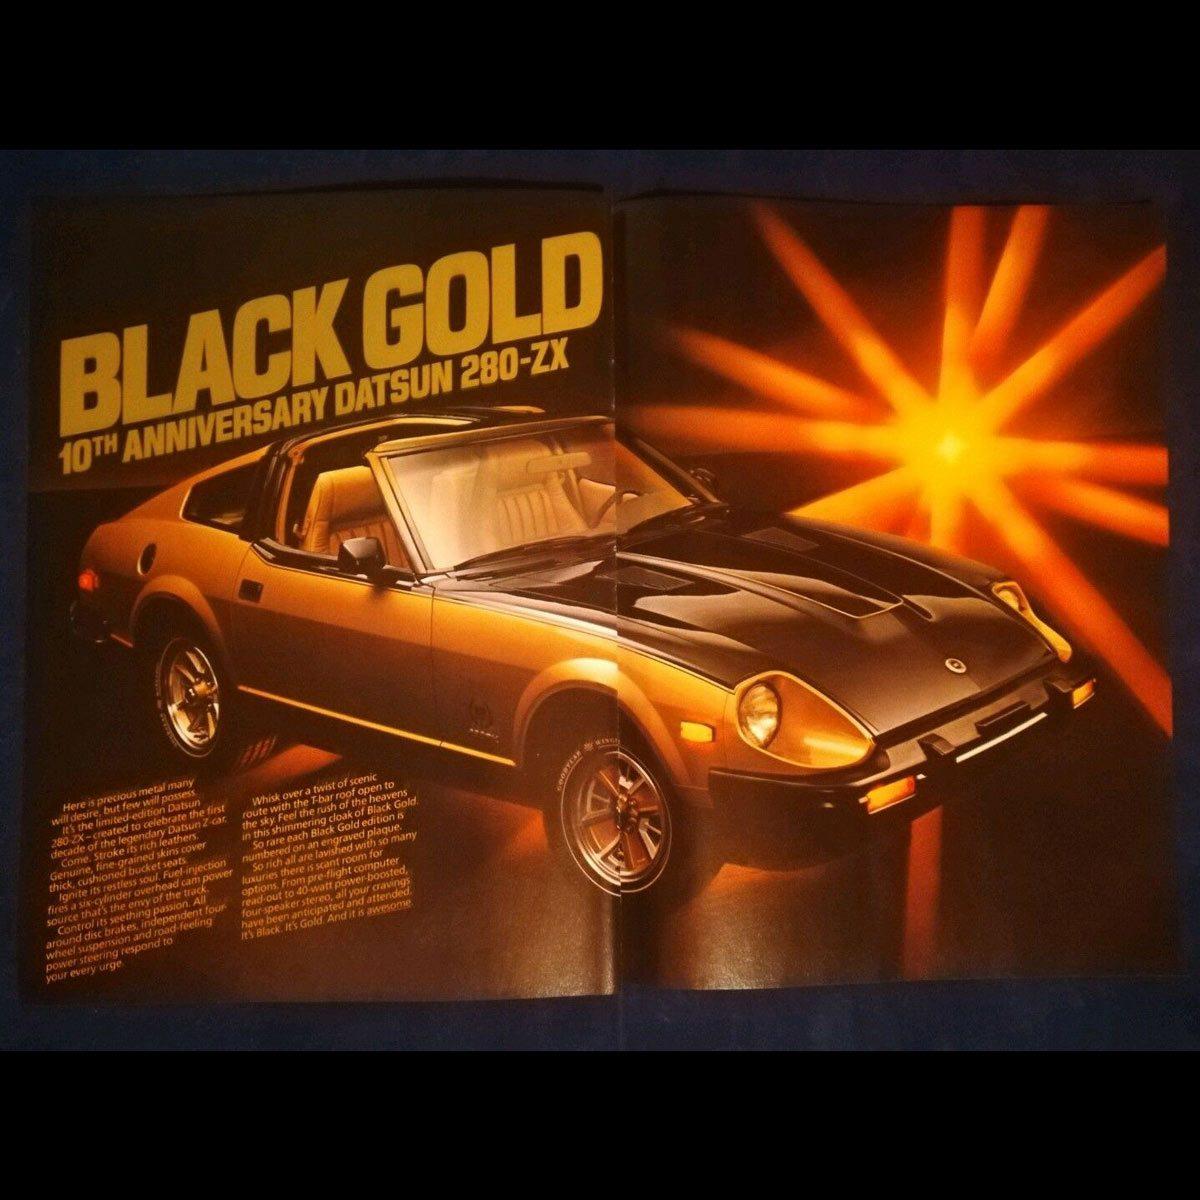 Datsun-280ZX-Black-Gold-1980